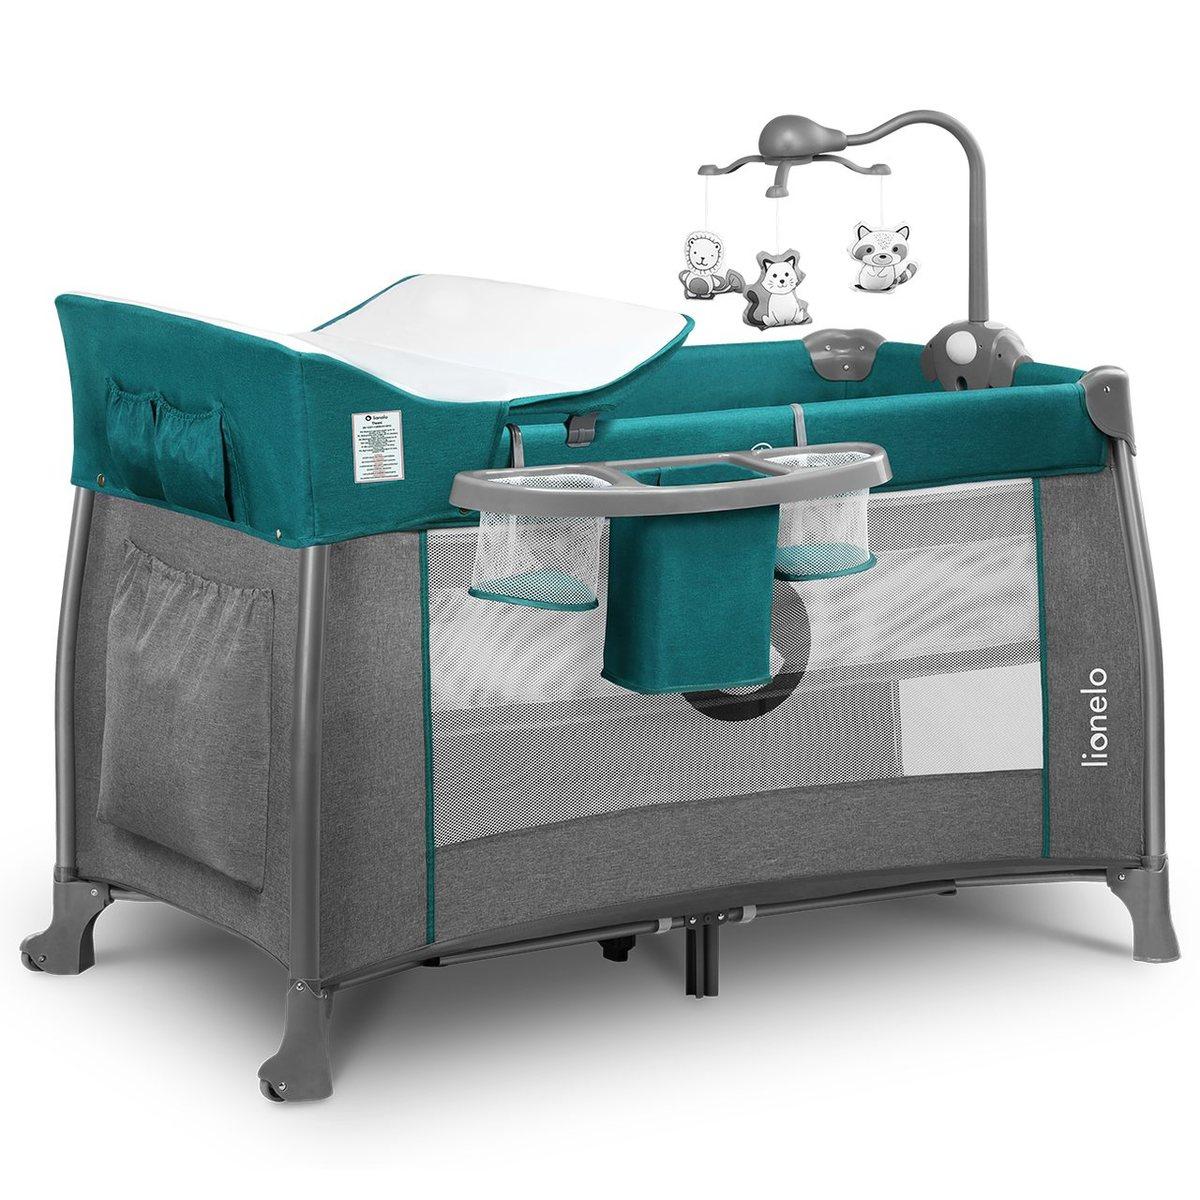 Lionelo Holiday bed Thomi Green Turguoise modrá sivá